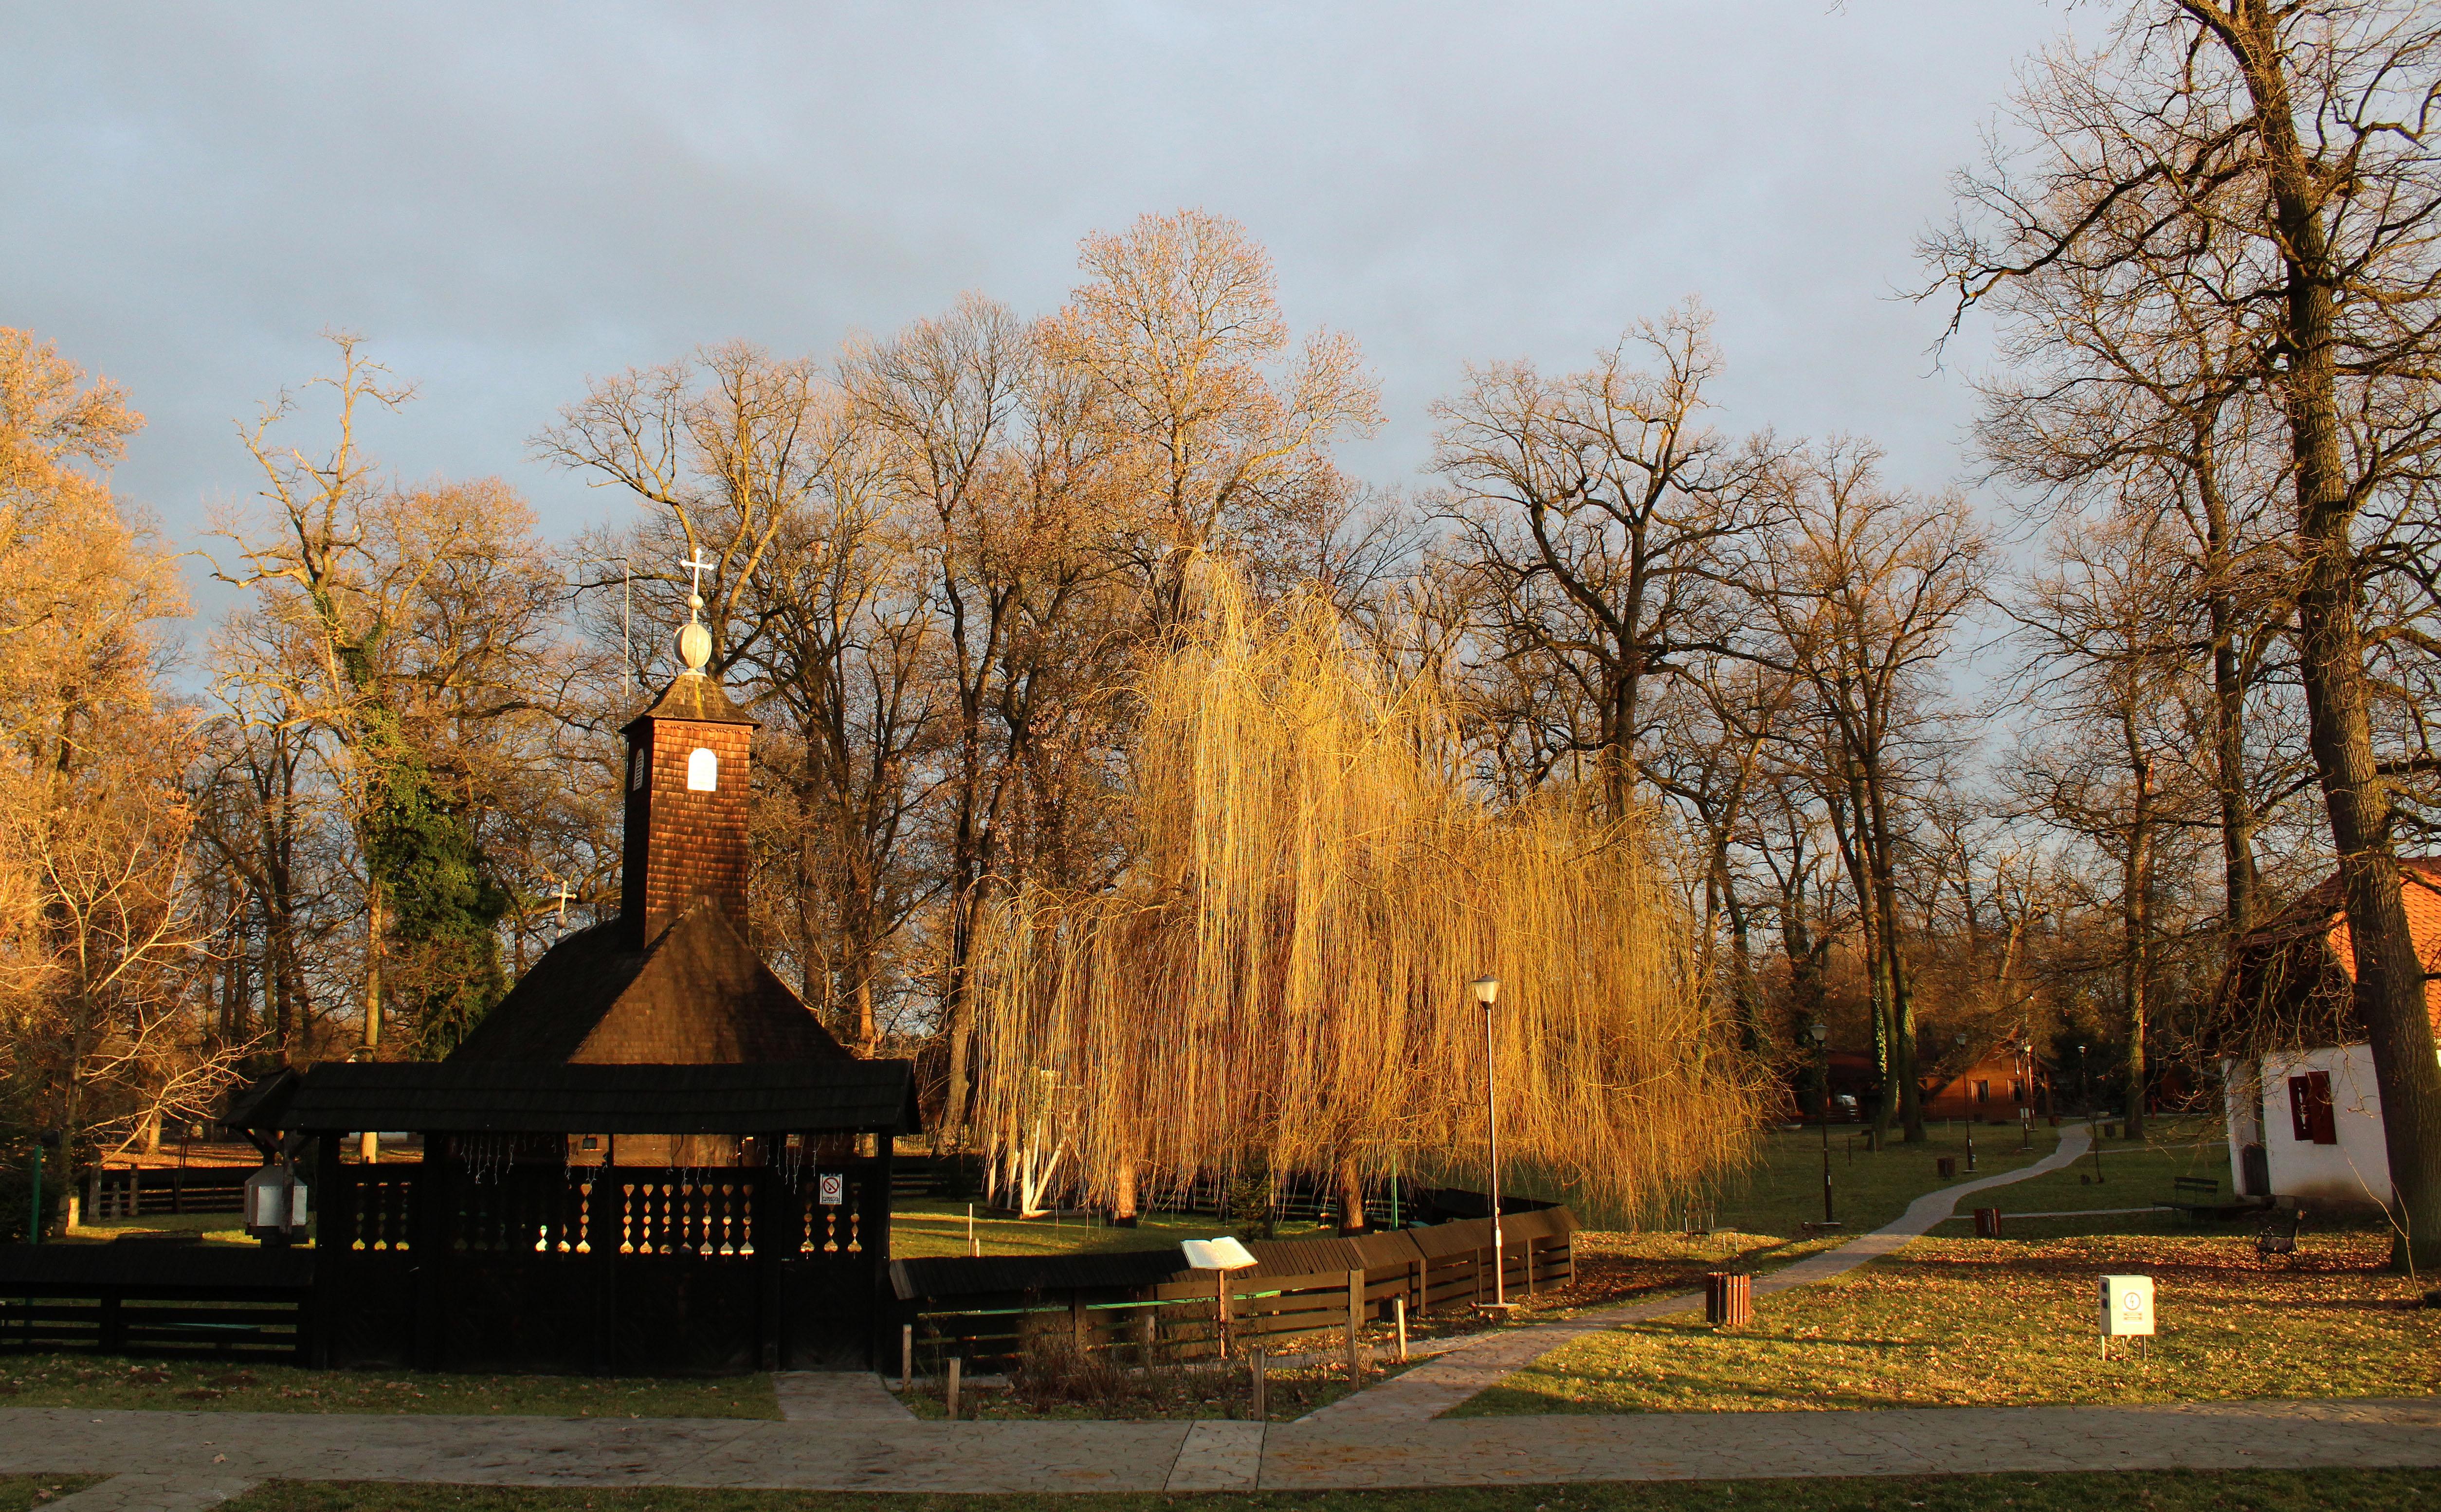 Biserica din Topla  (Jud. Timiş)